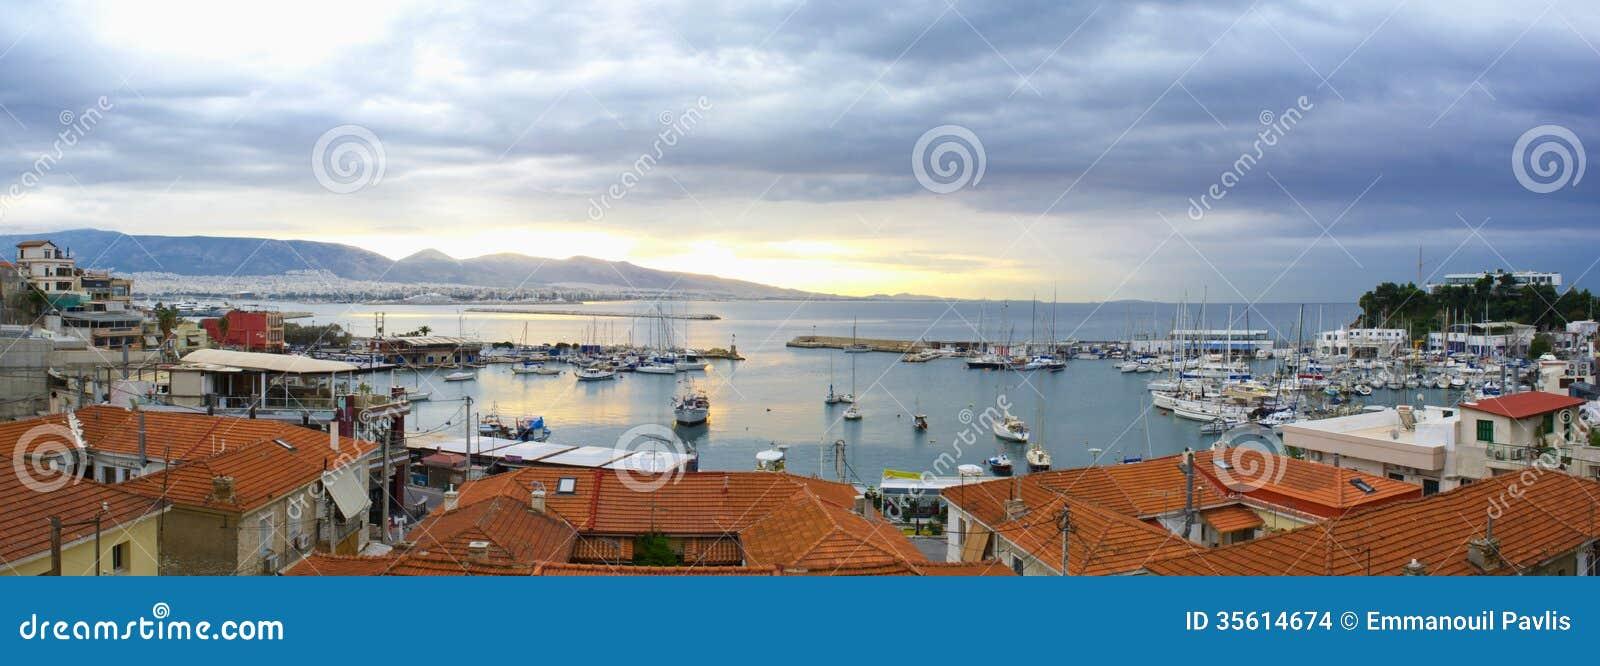 Porto pittoresco